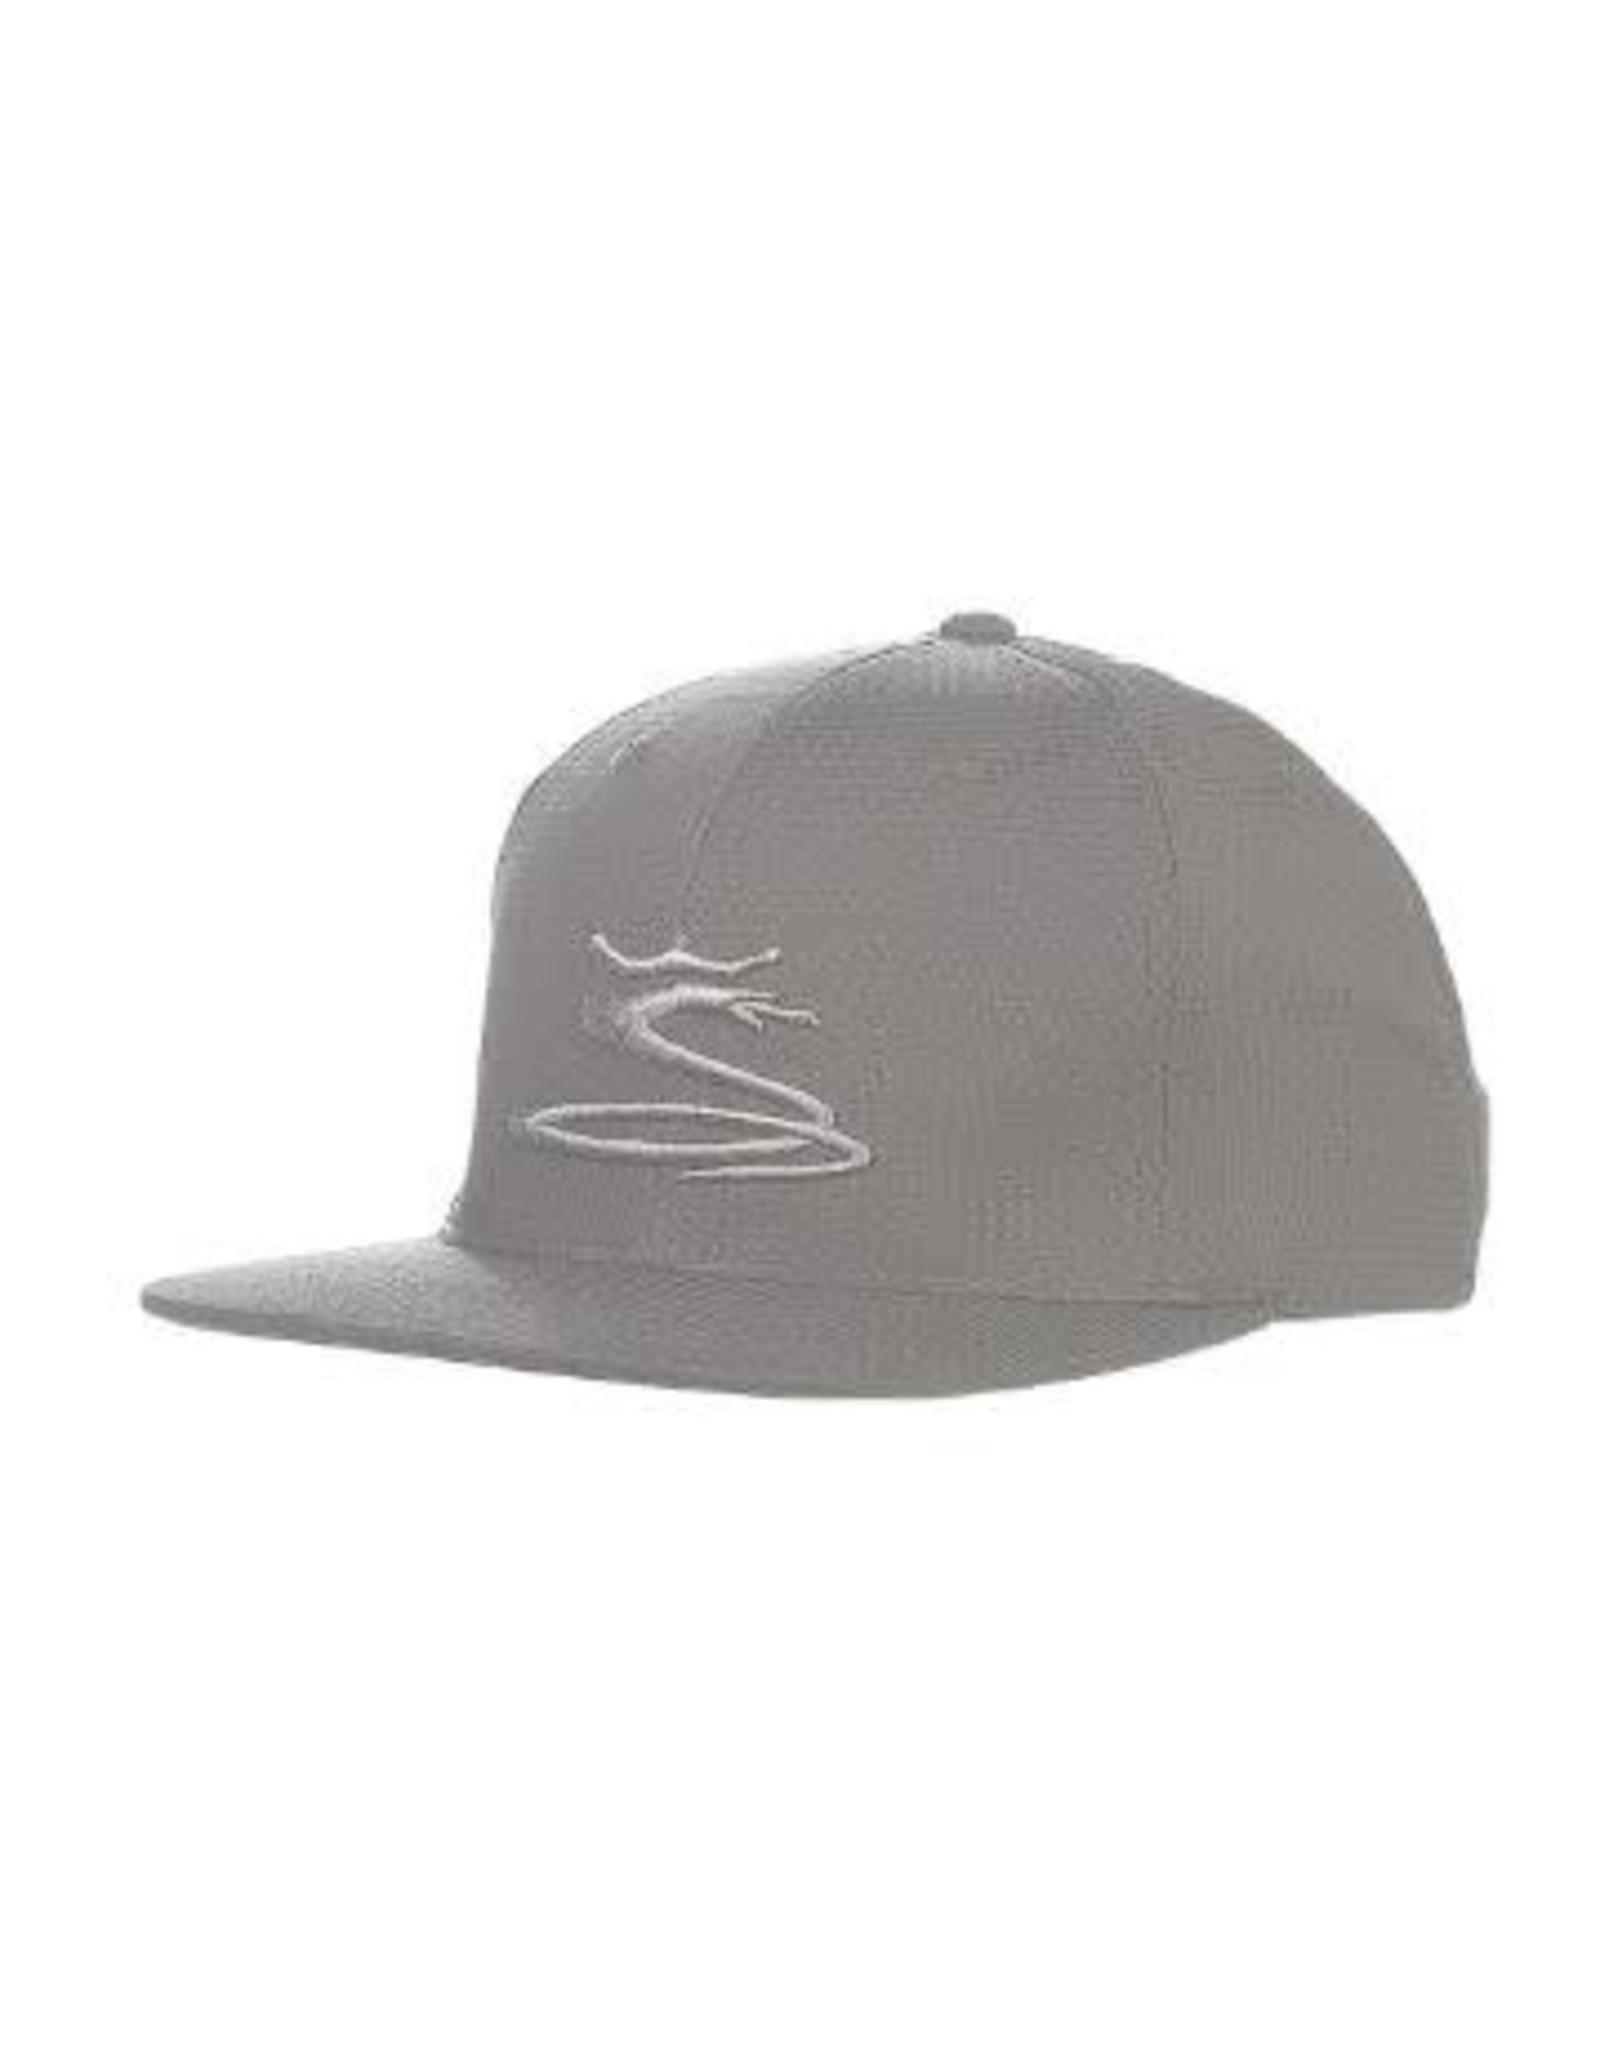 Cobra Tour Snake Snapback Hat